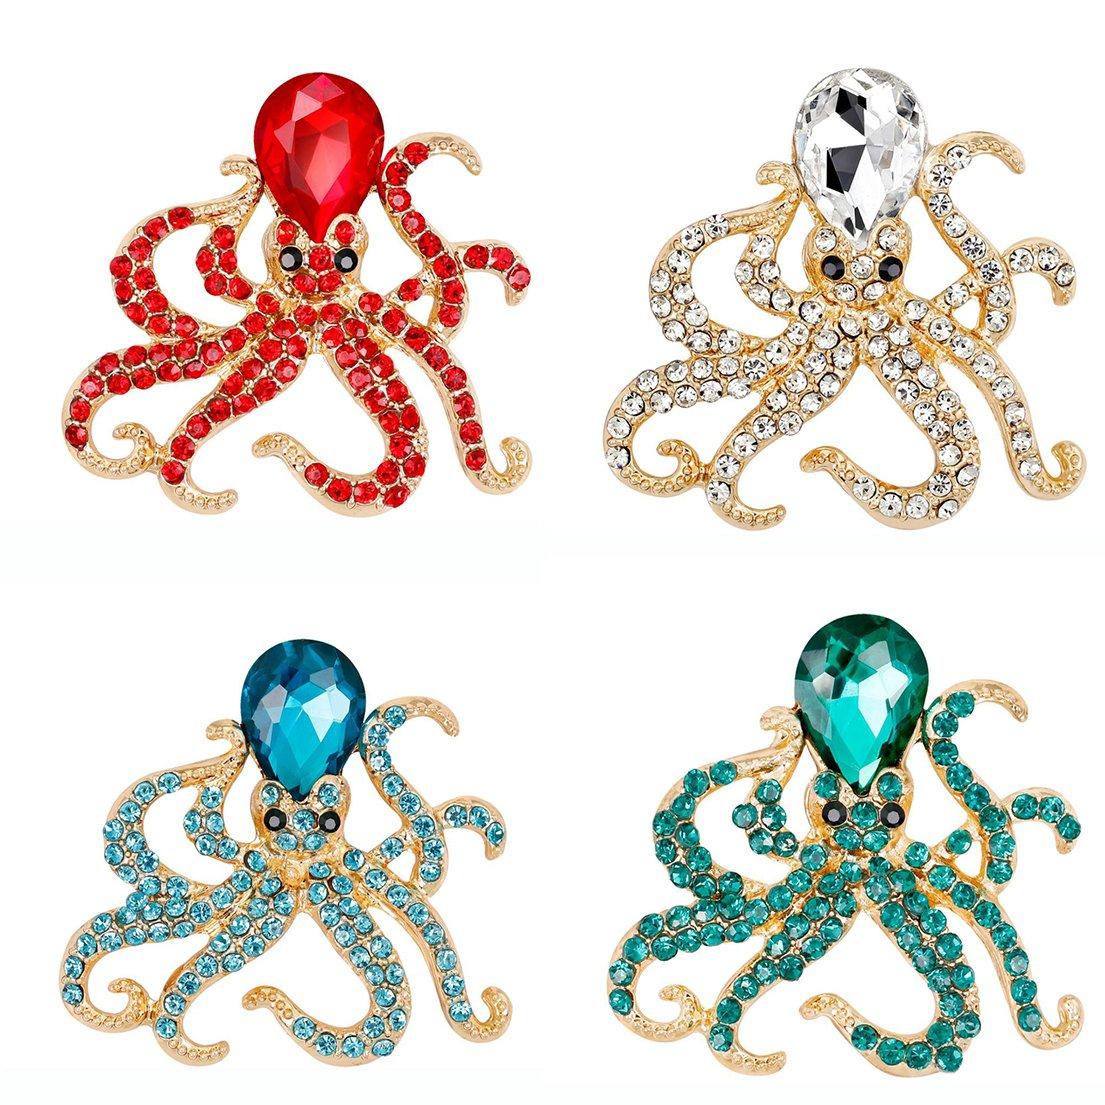 Alonea Octopus Brooch, Women Crystal Diamond Dragonfly Brooch Retro Copper Brooches Collar (4 Pack❤️)